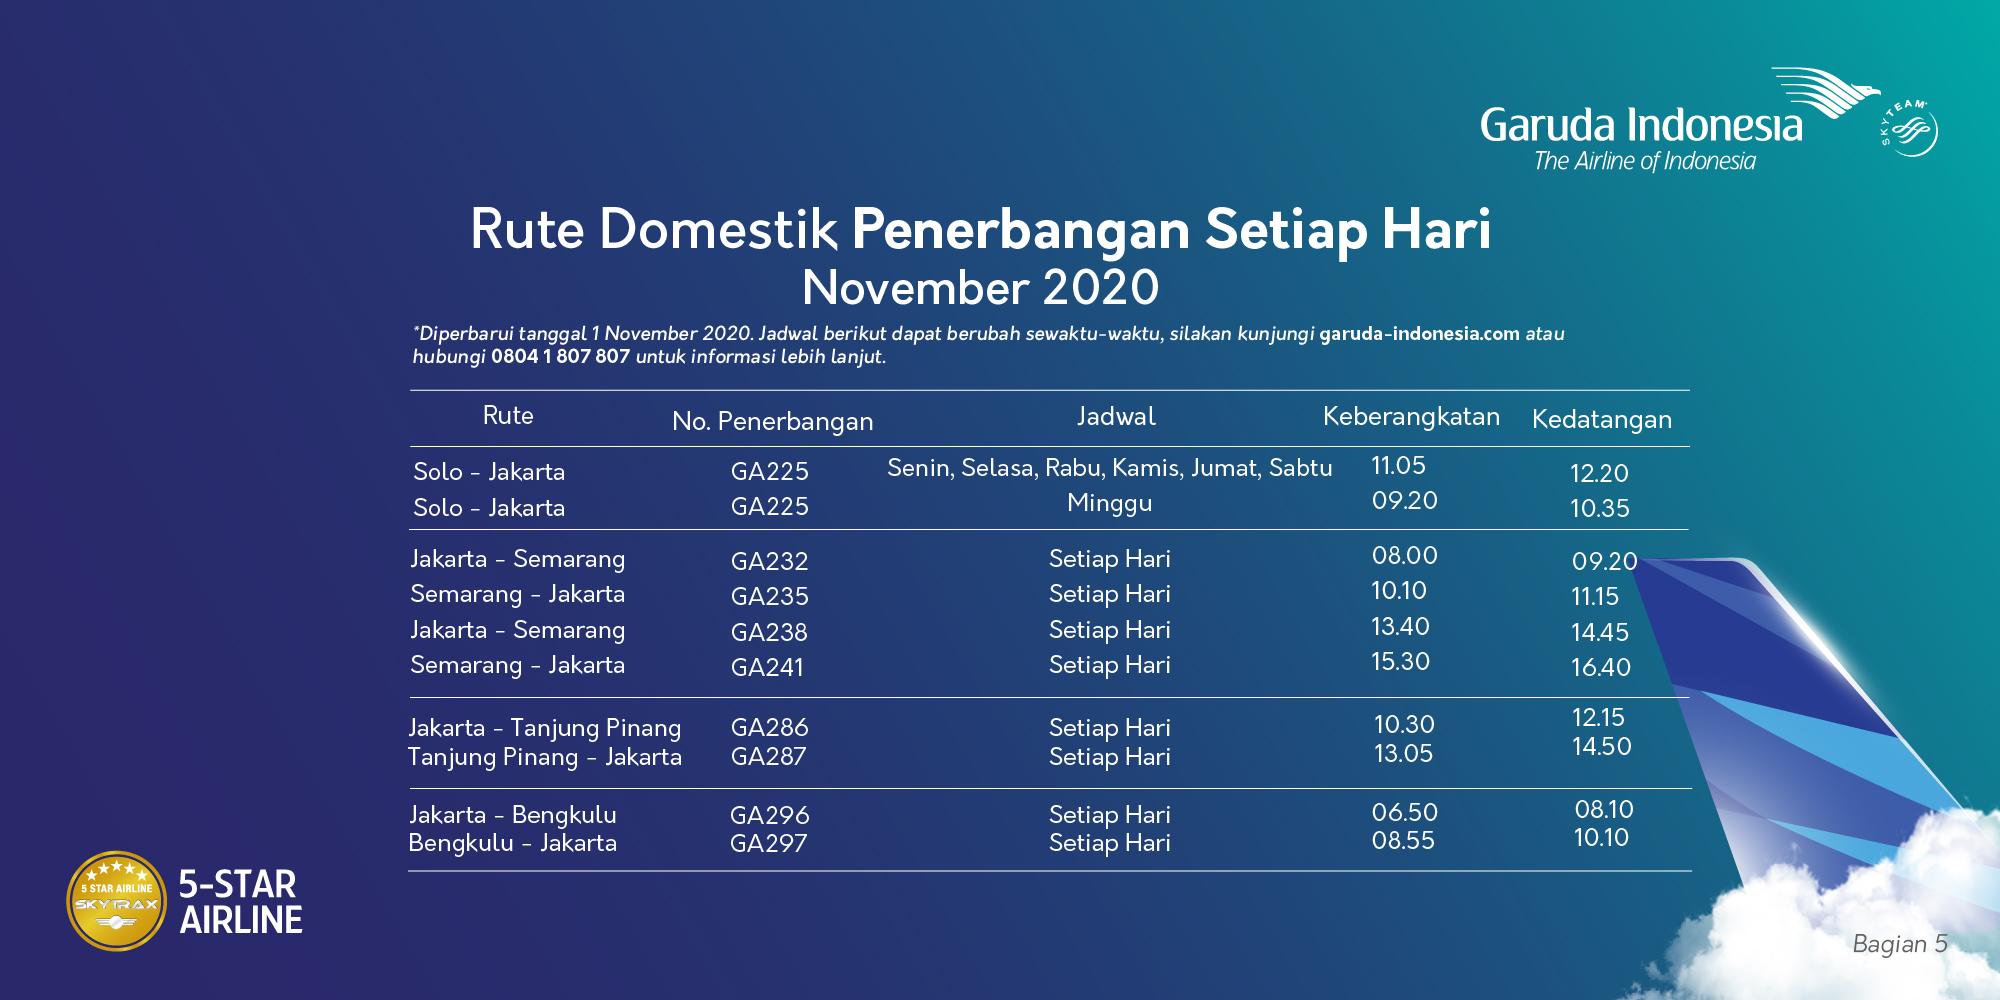 Jadwal Penerbangan Garuda Indonesia Rute Domestik November